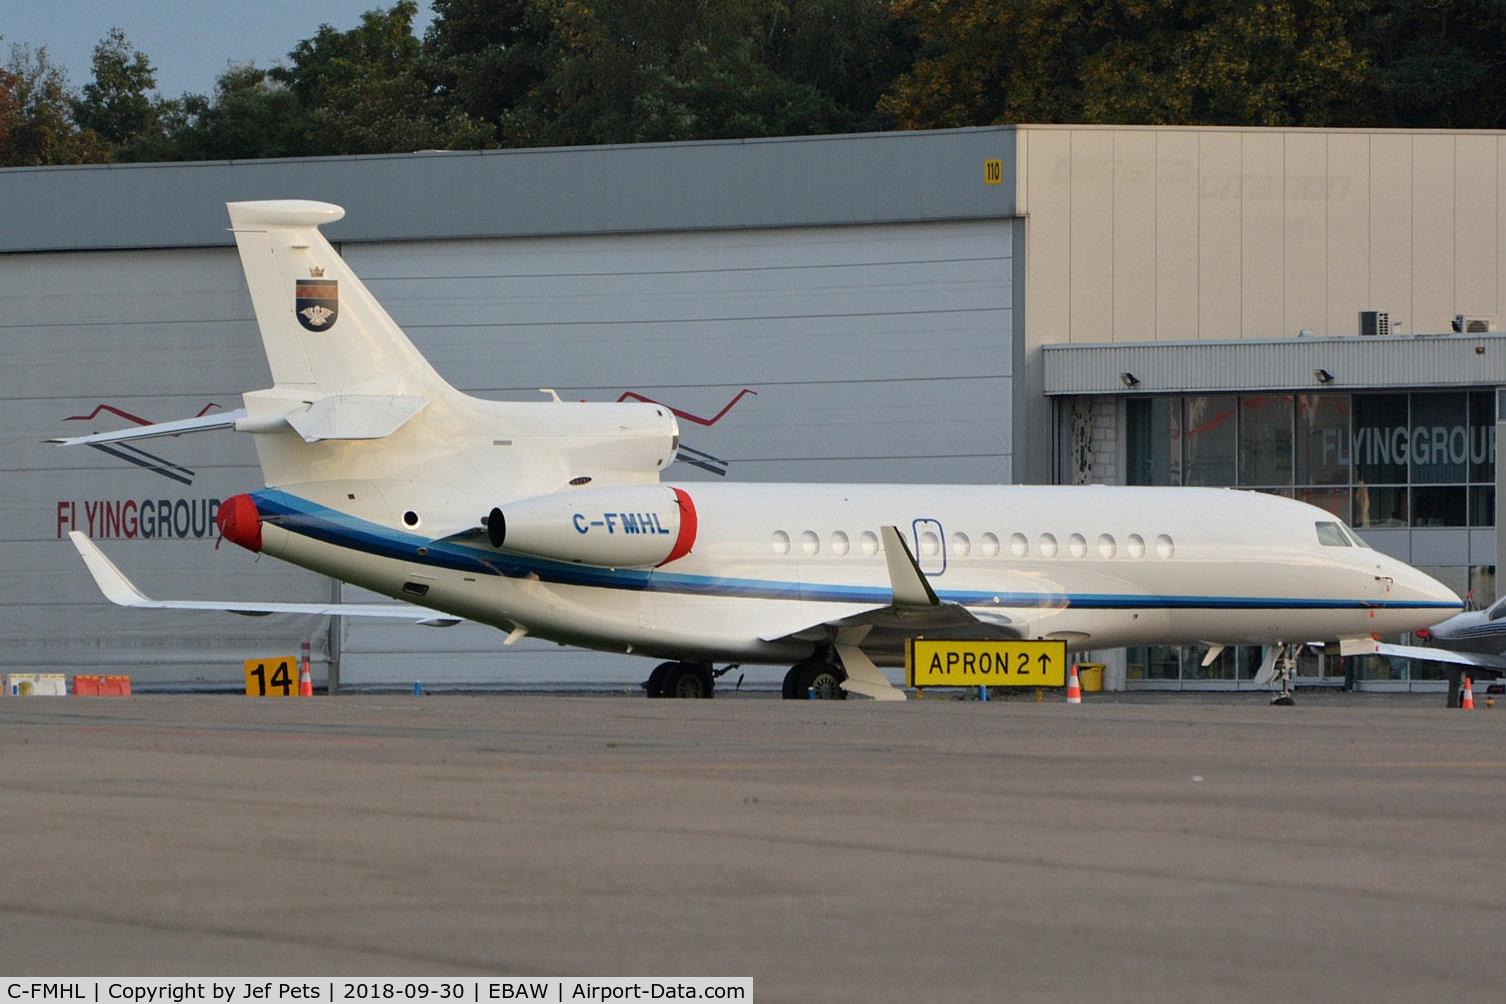 C-FMHL, 2012 Dassault Falcon 7X C/N 172, At Antwerp Airport.